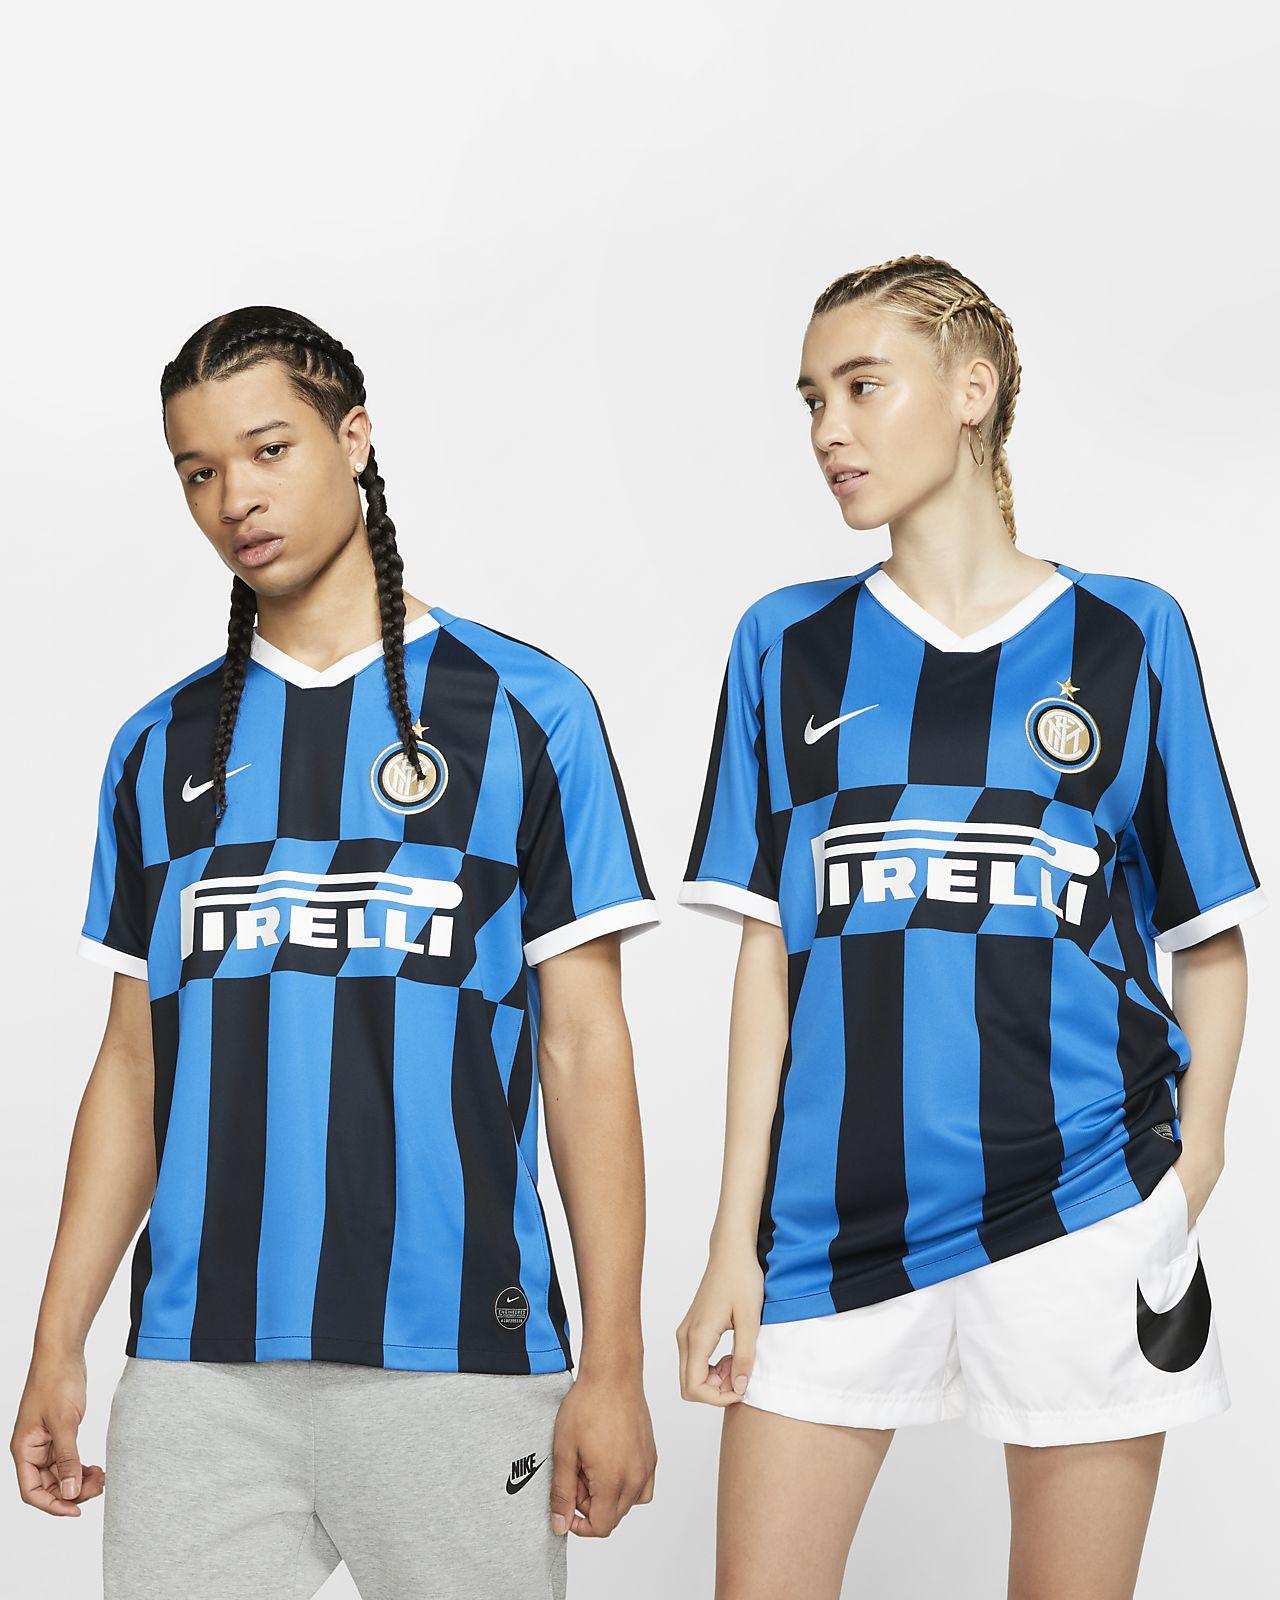 Inter claim Milan derby spoils | Shropshire Star  |Inter Milan